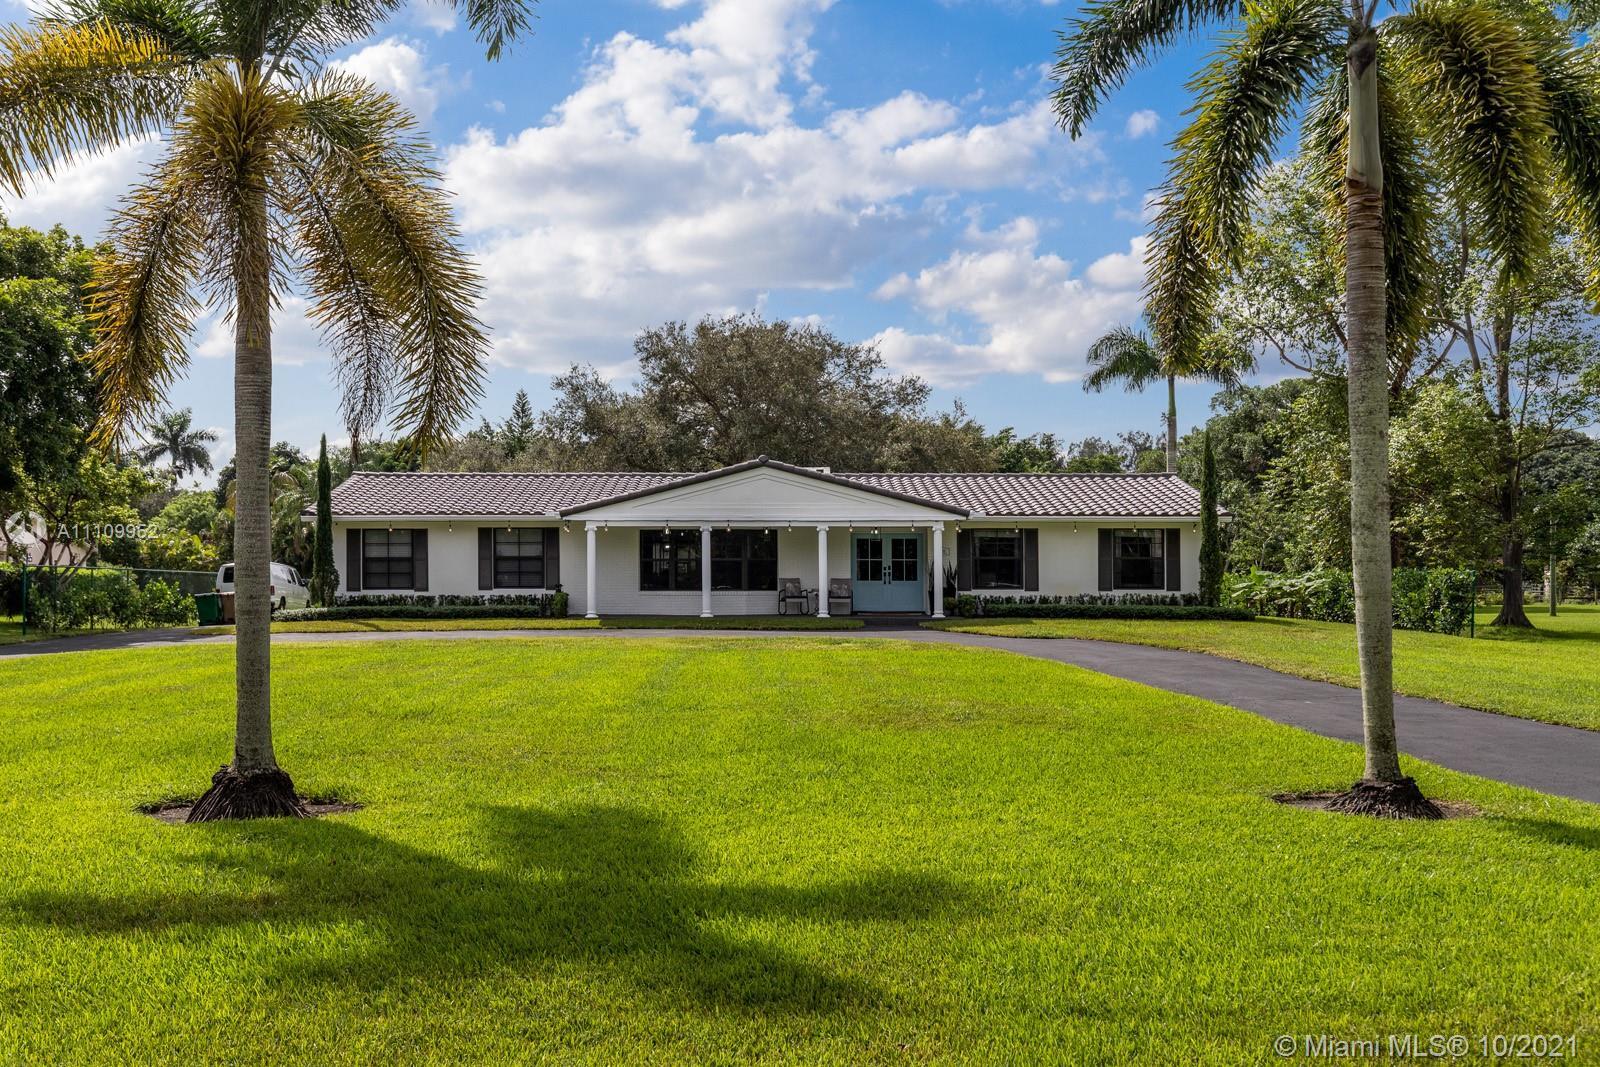 FLA Fruit Lands - 13850 SW 24th St, Davie, FL 33325